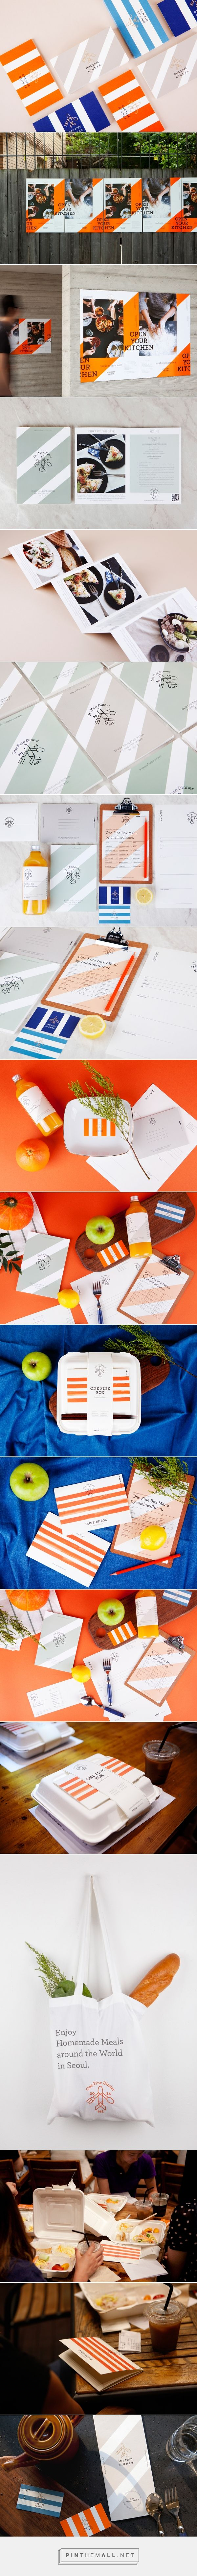 OneFineDinner Branding by Charry Jeon, ContentFormConte, KIWOONG HONG